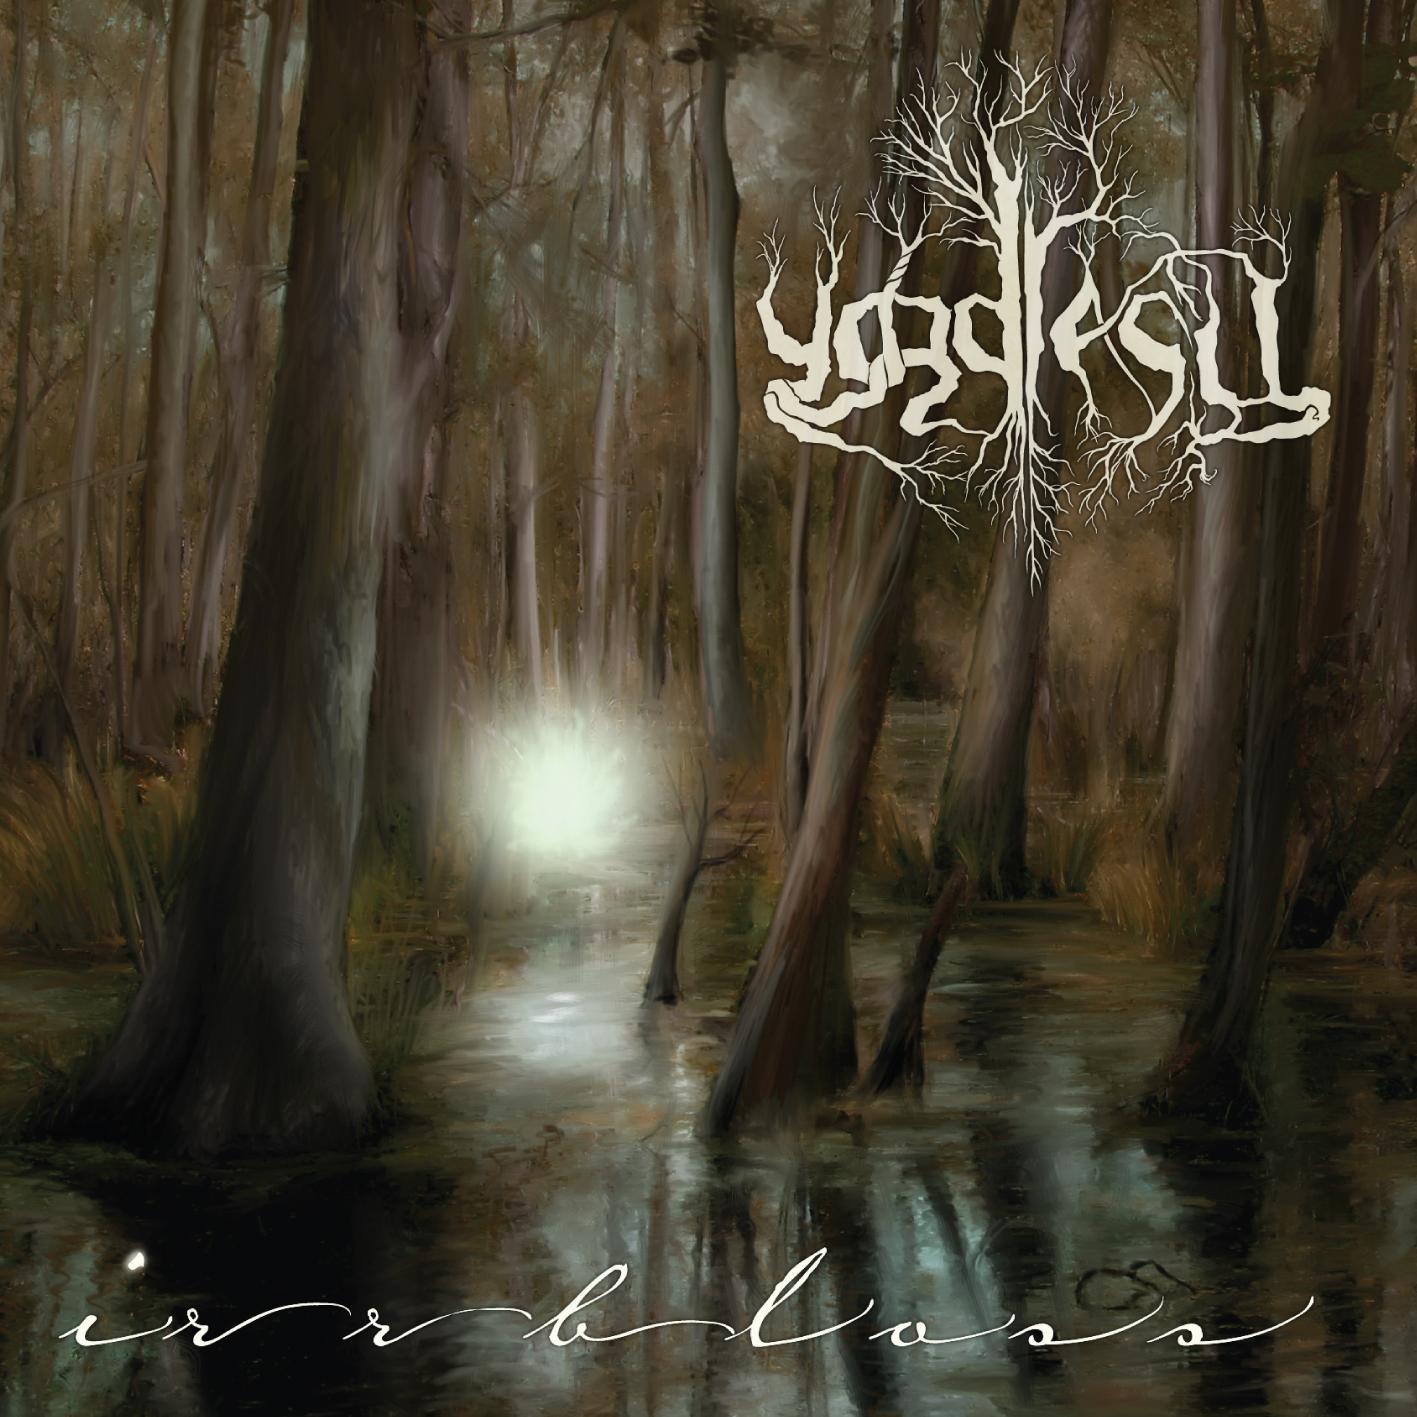 Yggdrasil Reviews